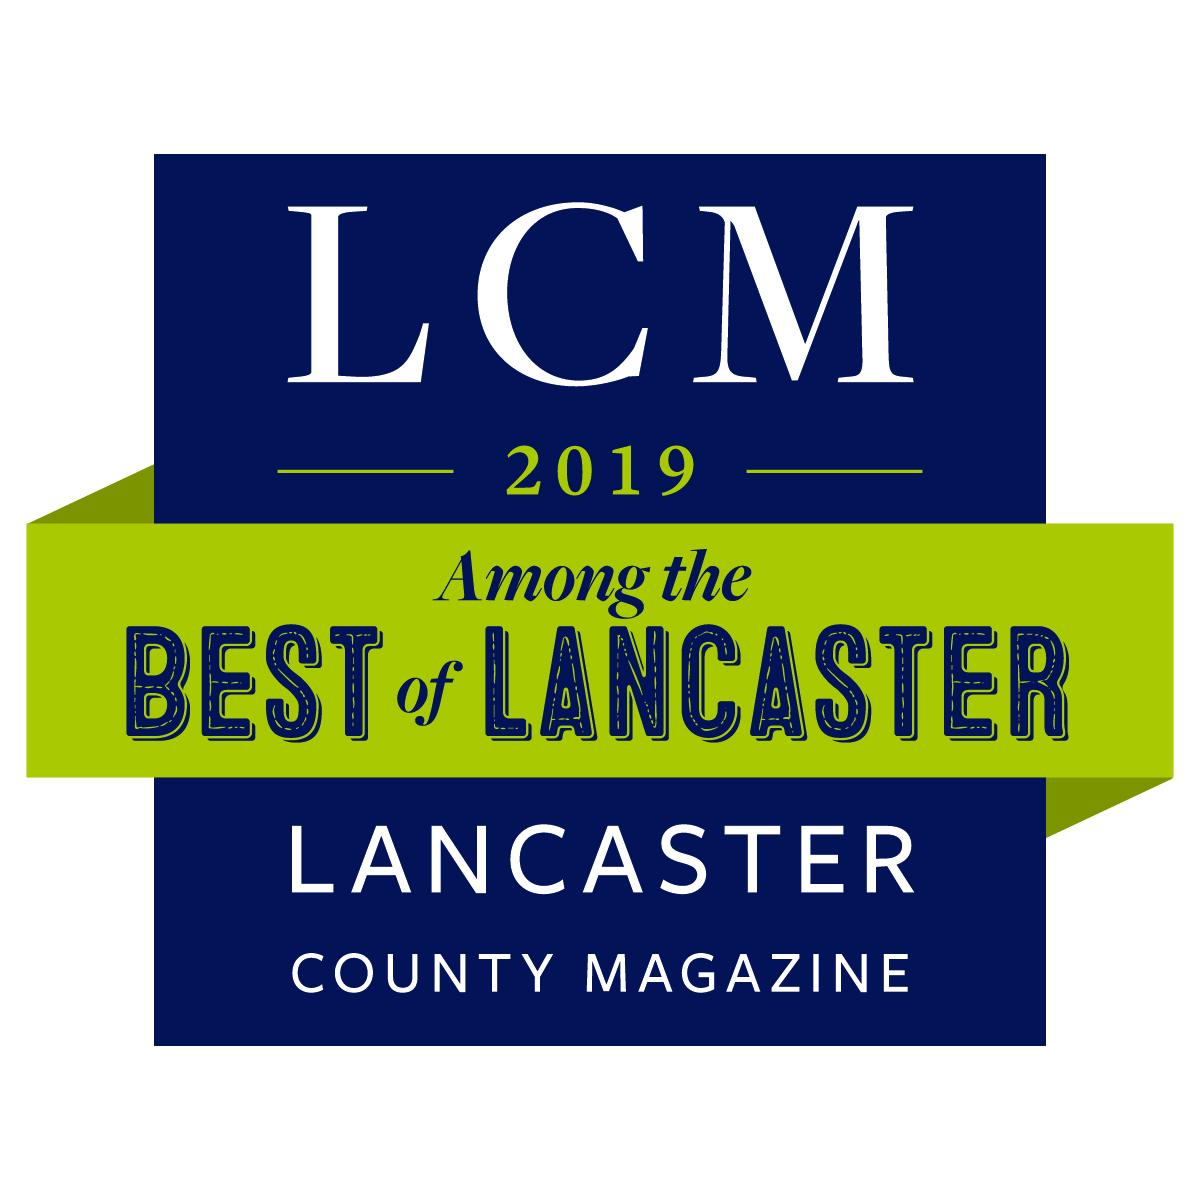 Best of Lancaster - Lancaster County Magazine 2019